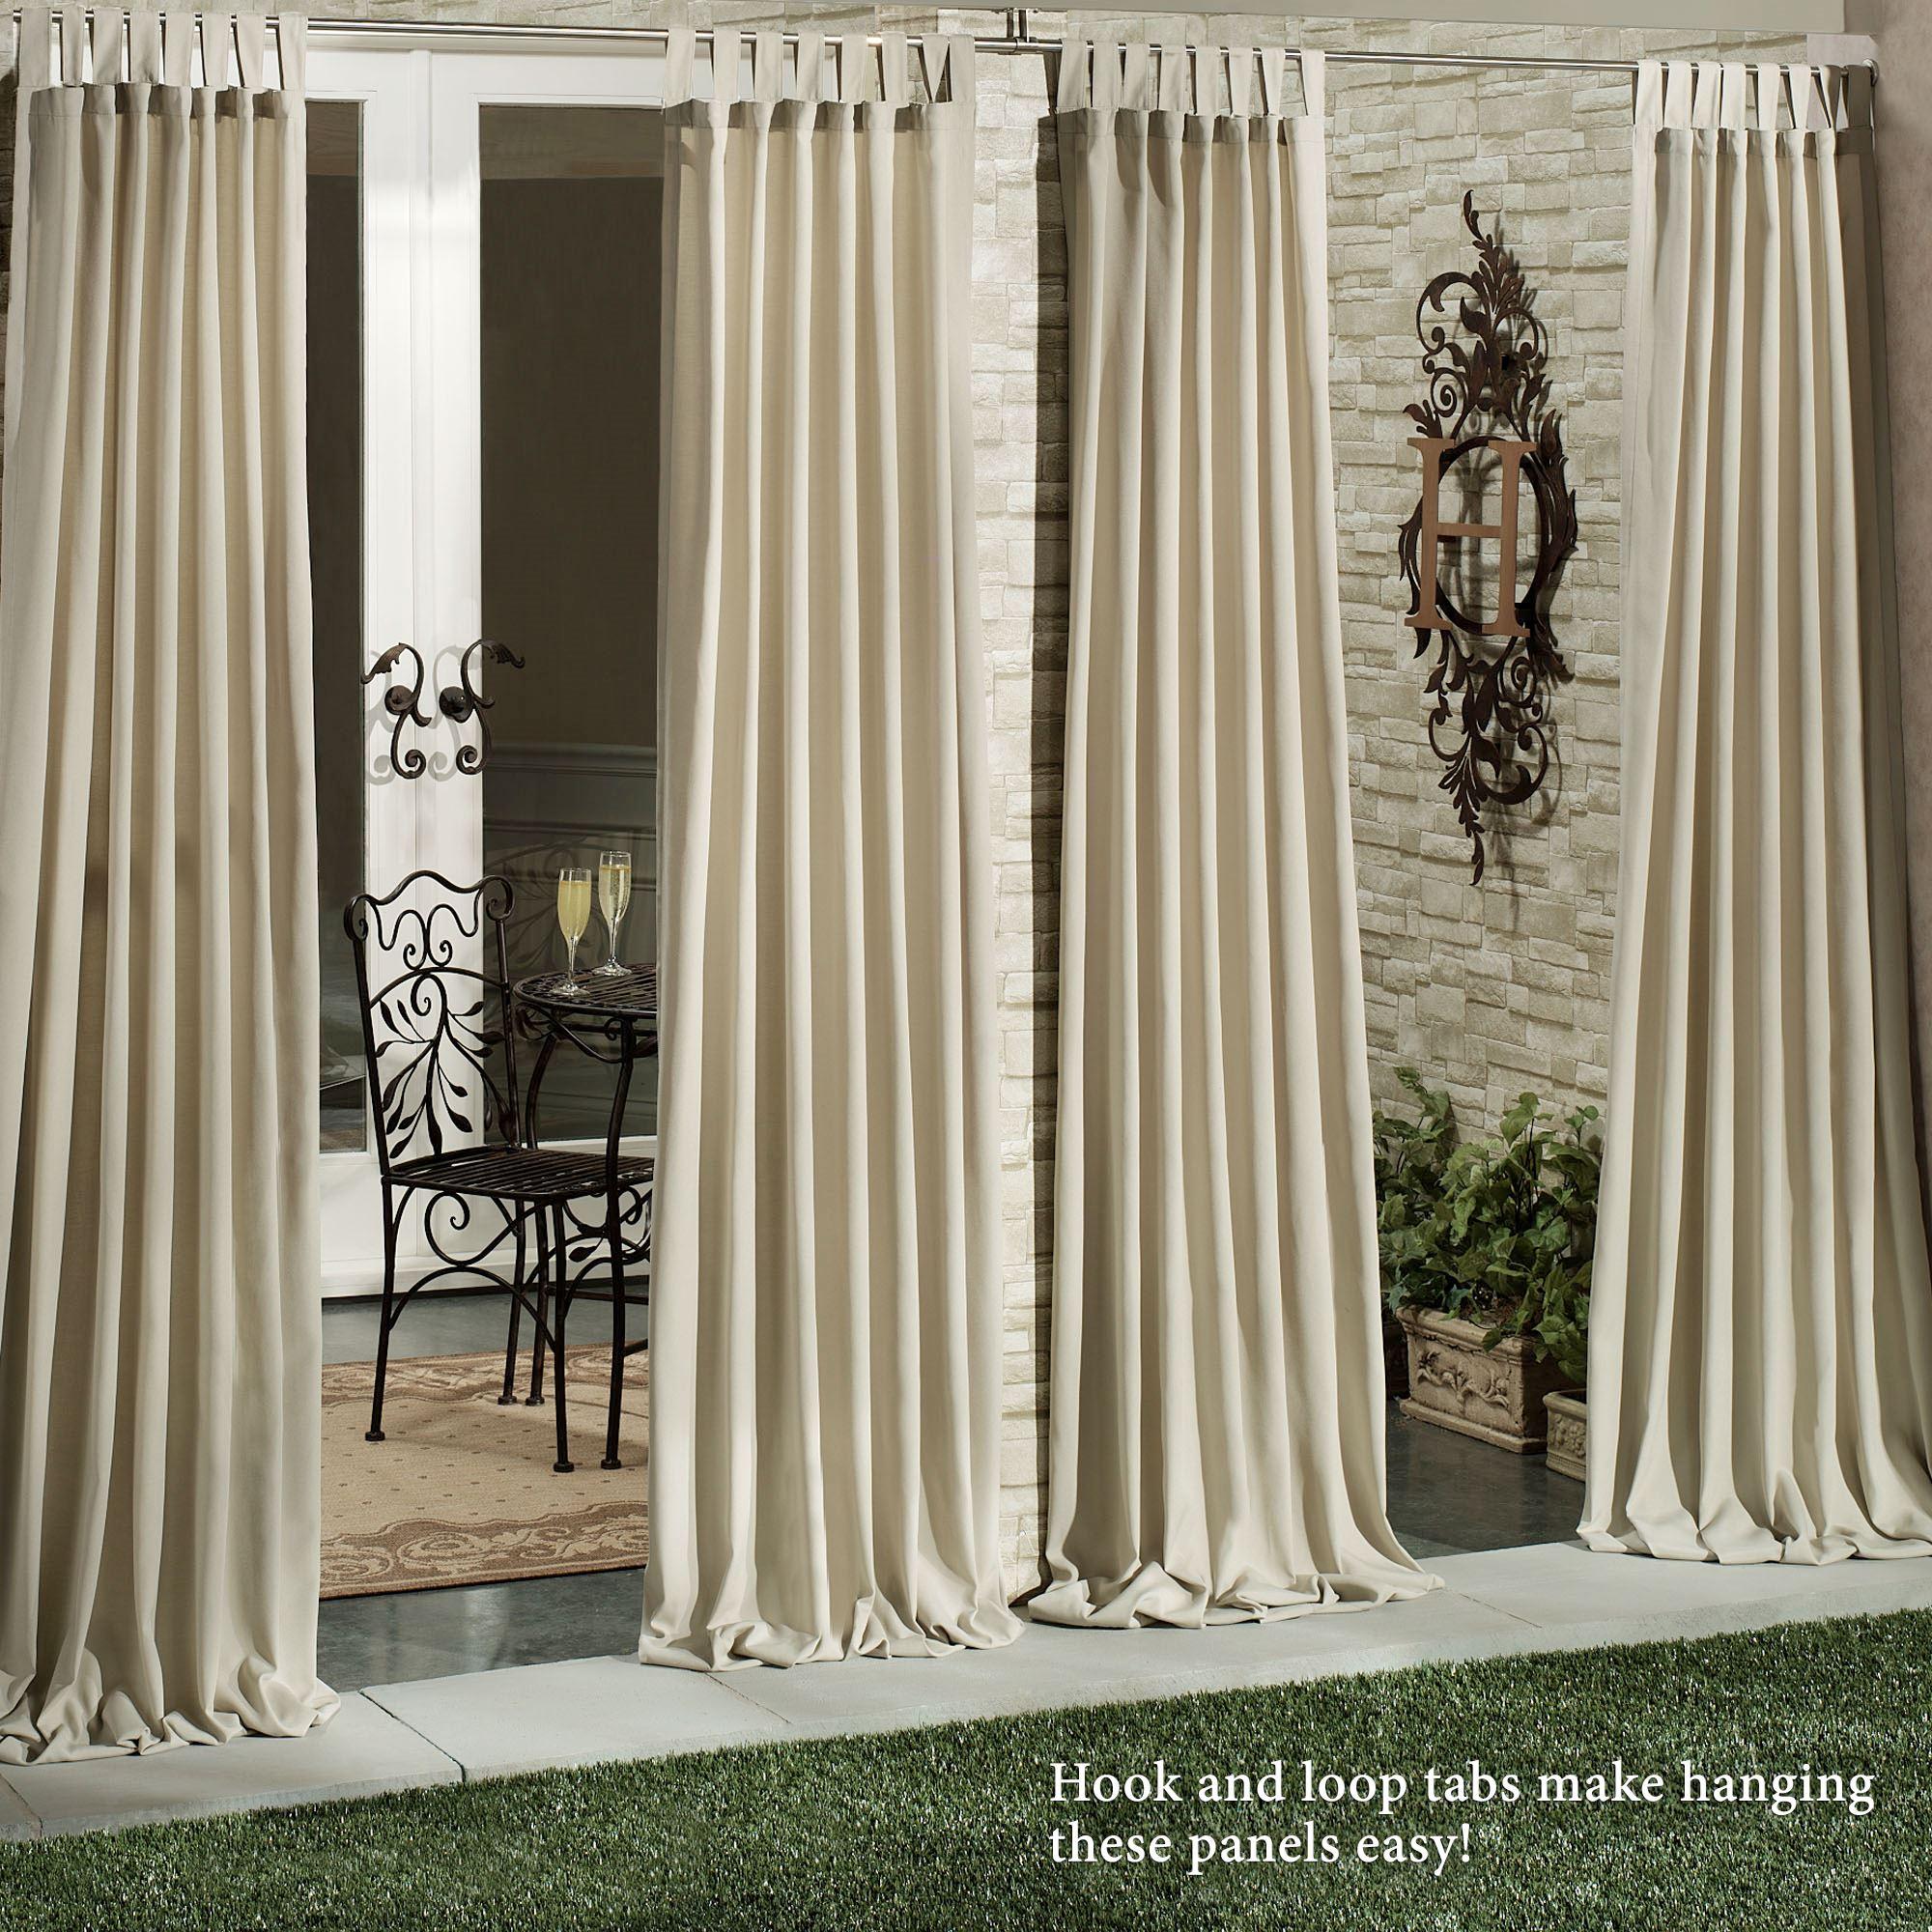 Matine Indoor Outdoor Tab Top Curtain Panels Regarding Matine Indoor/outdoor Curtain Panels (View 3 of 20)